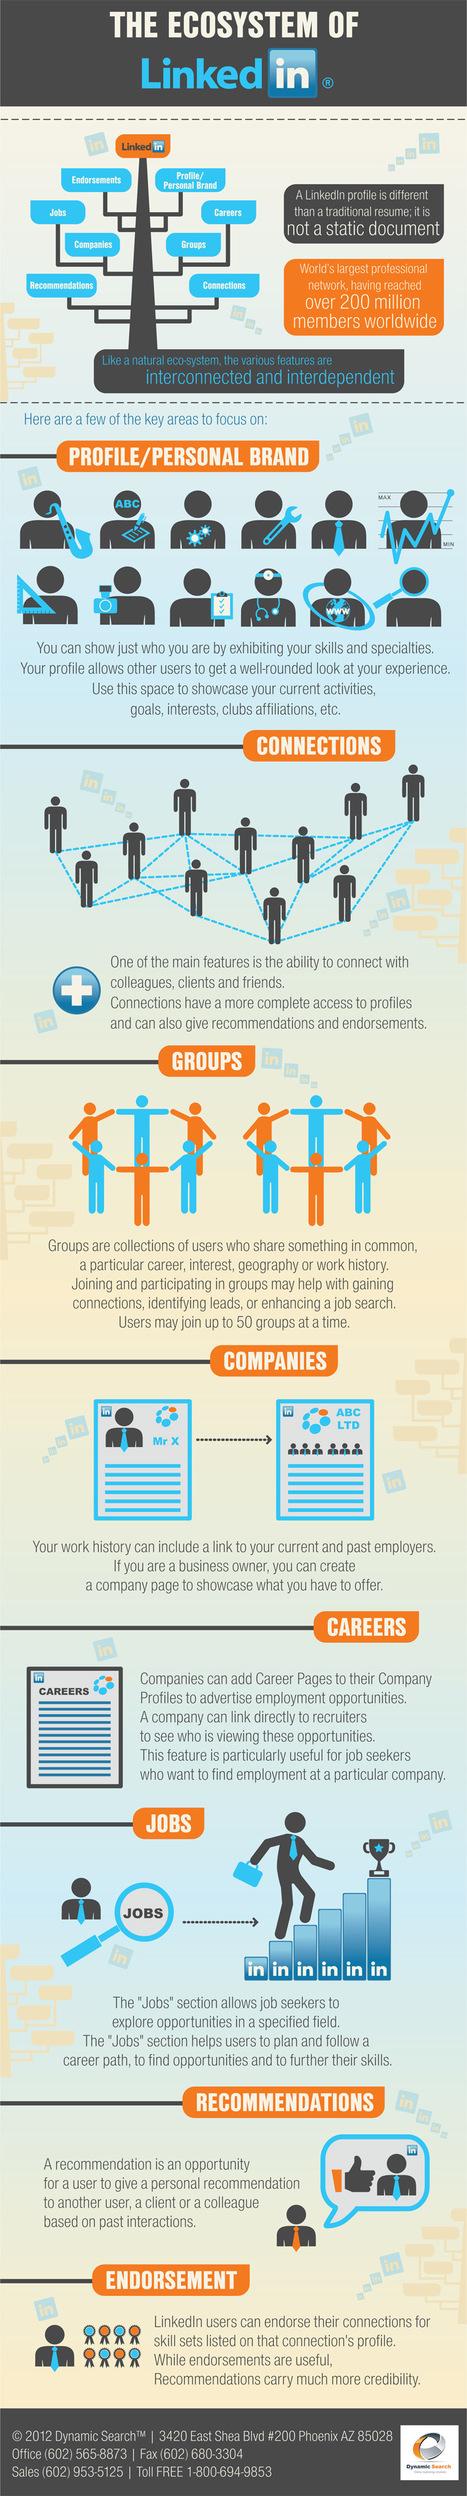 Understanding the LinkedIn Ecosystem in one minute via an infographic /@BerriePelser -  SUPERgURL MARKETING | Social Media | Scoop.it